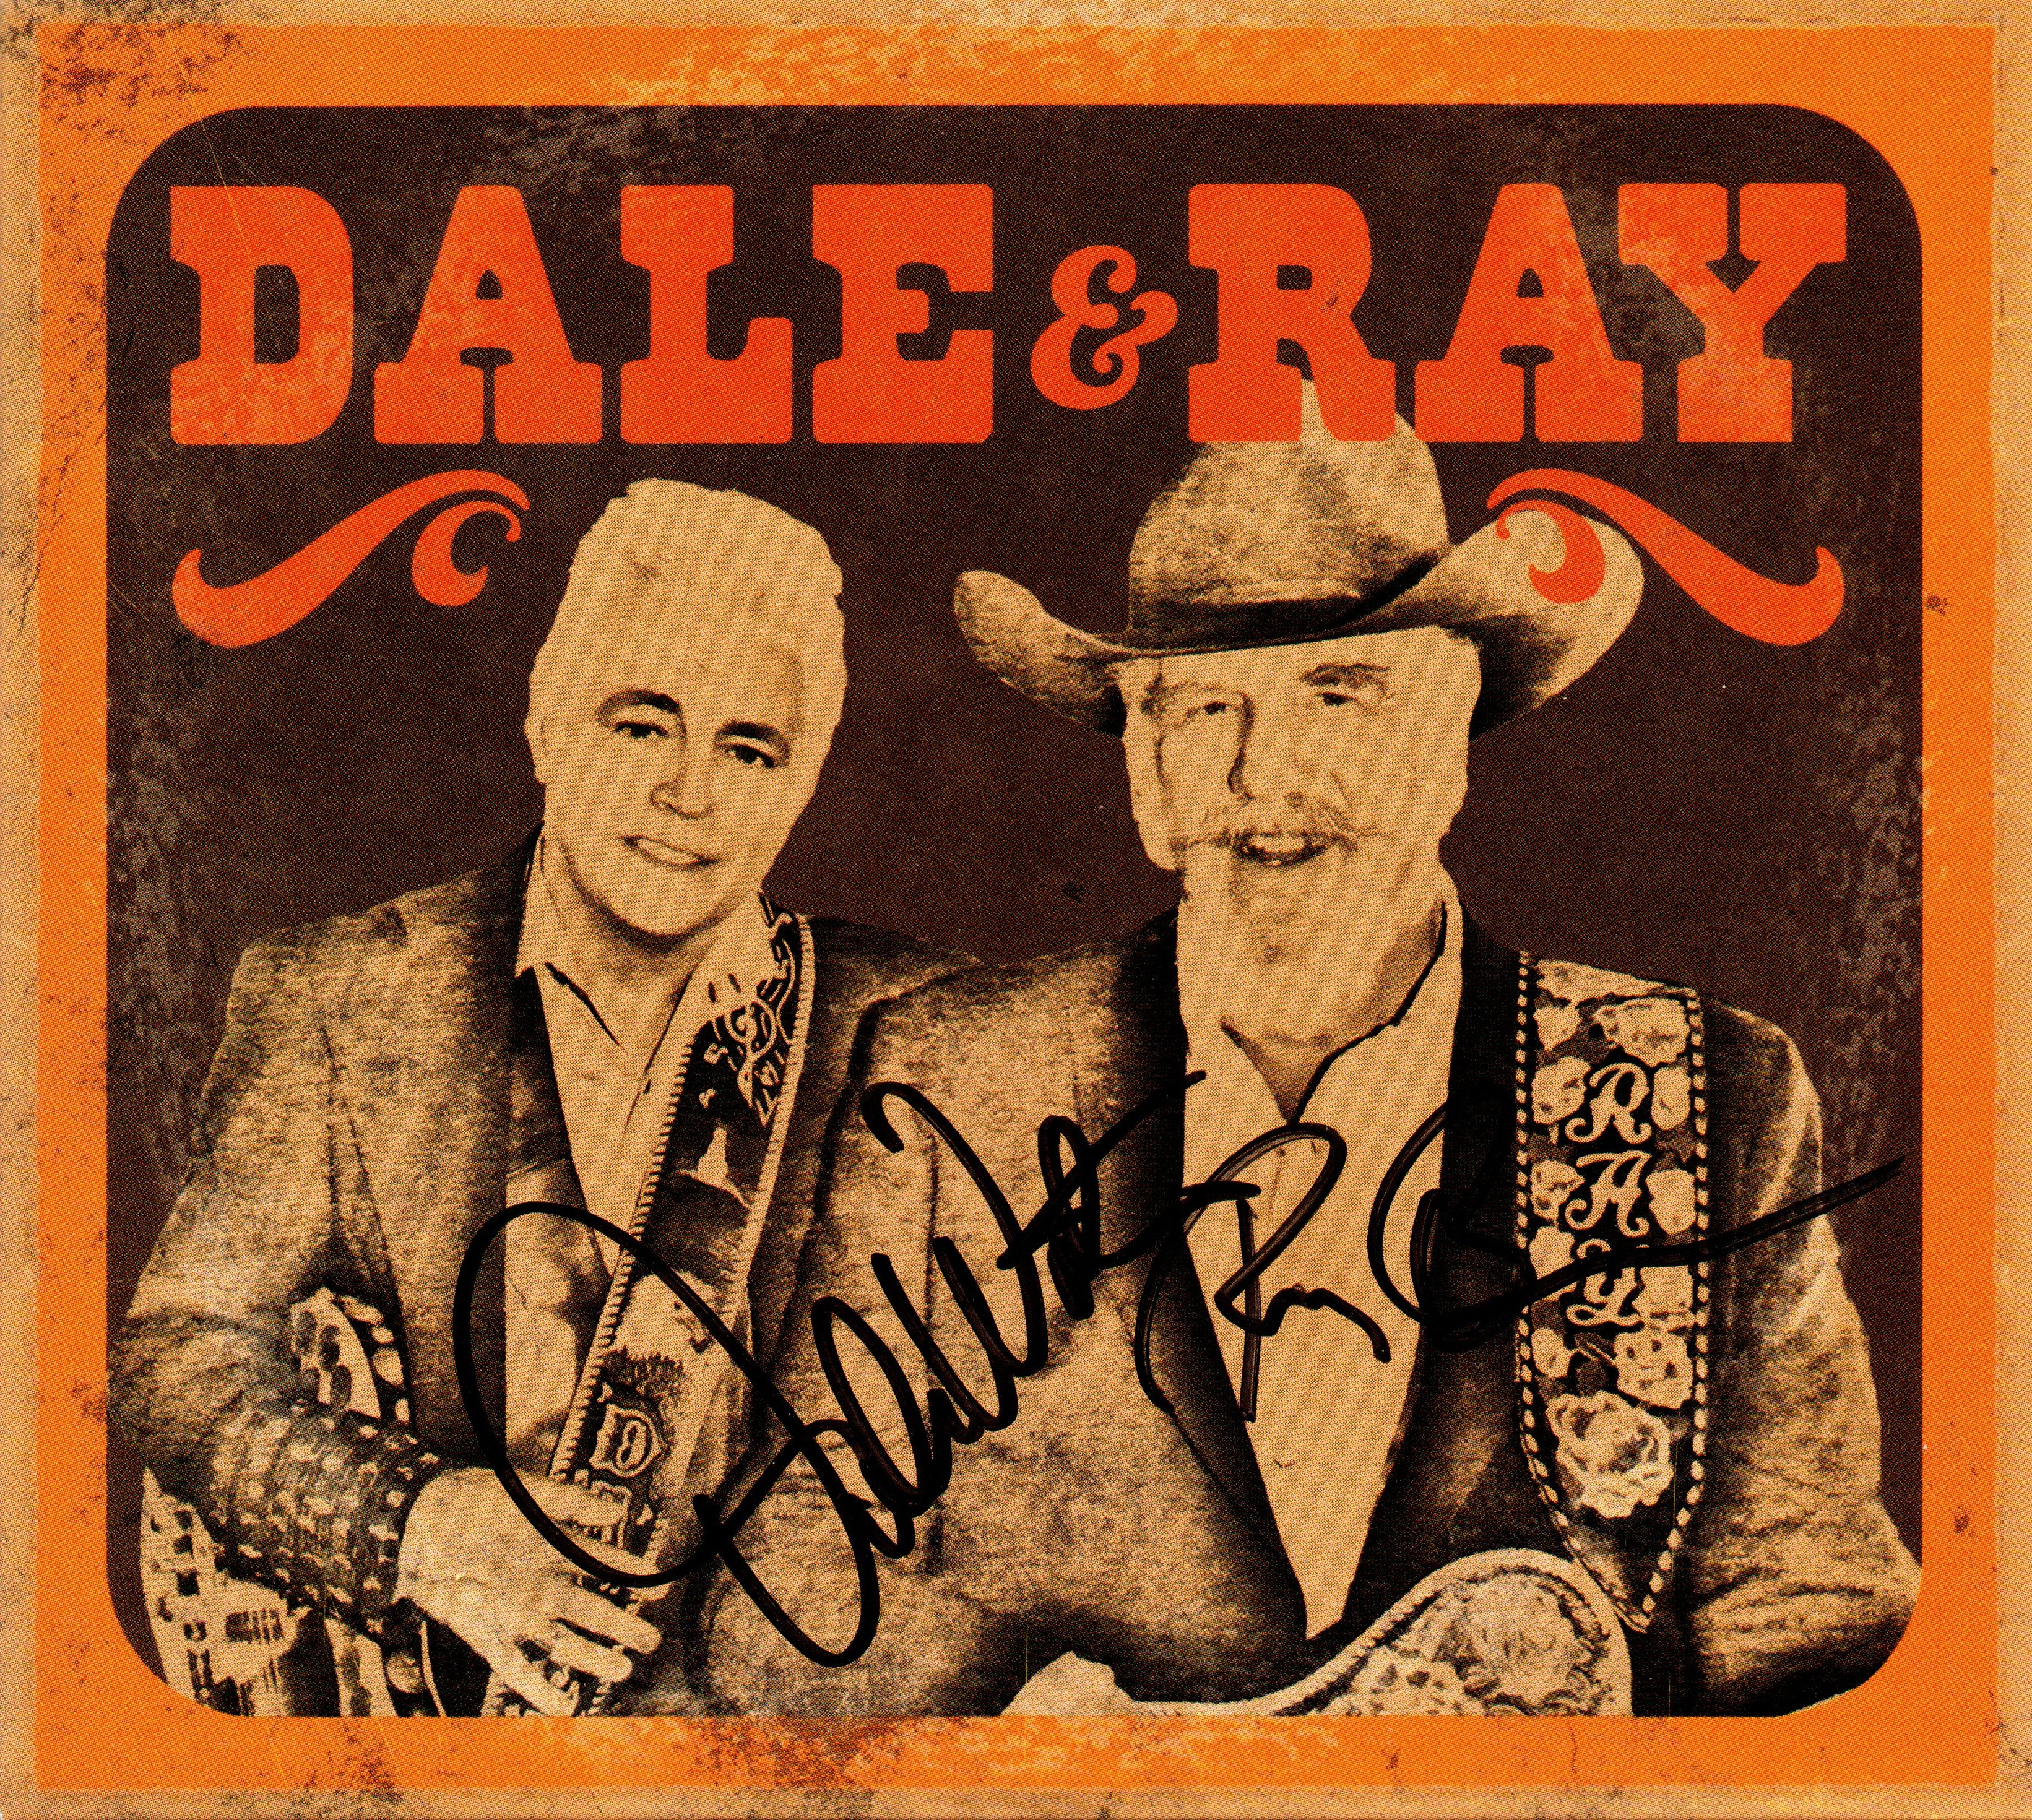 DaleAndRay2017-04-05BullRunRestaurantShirleyMA.jpg